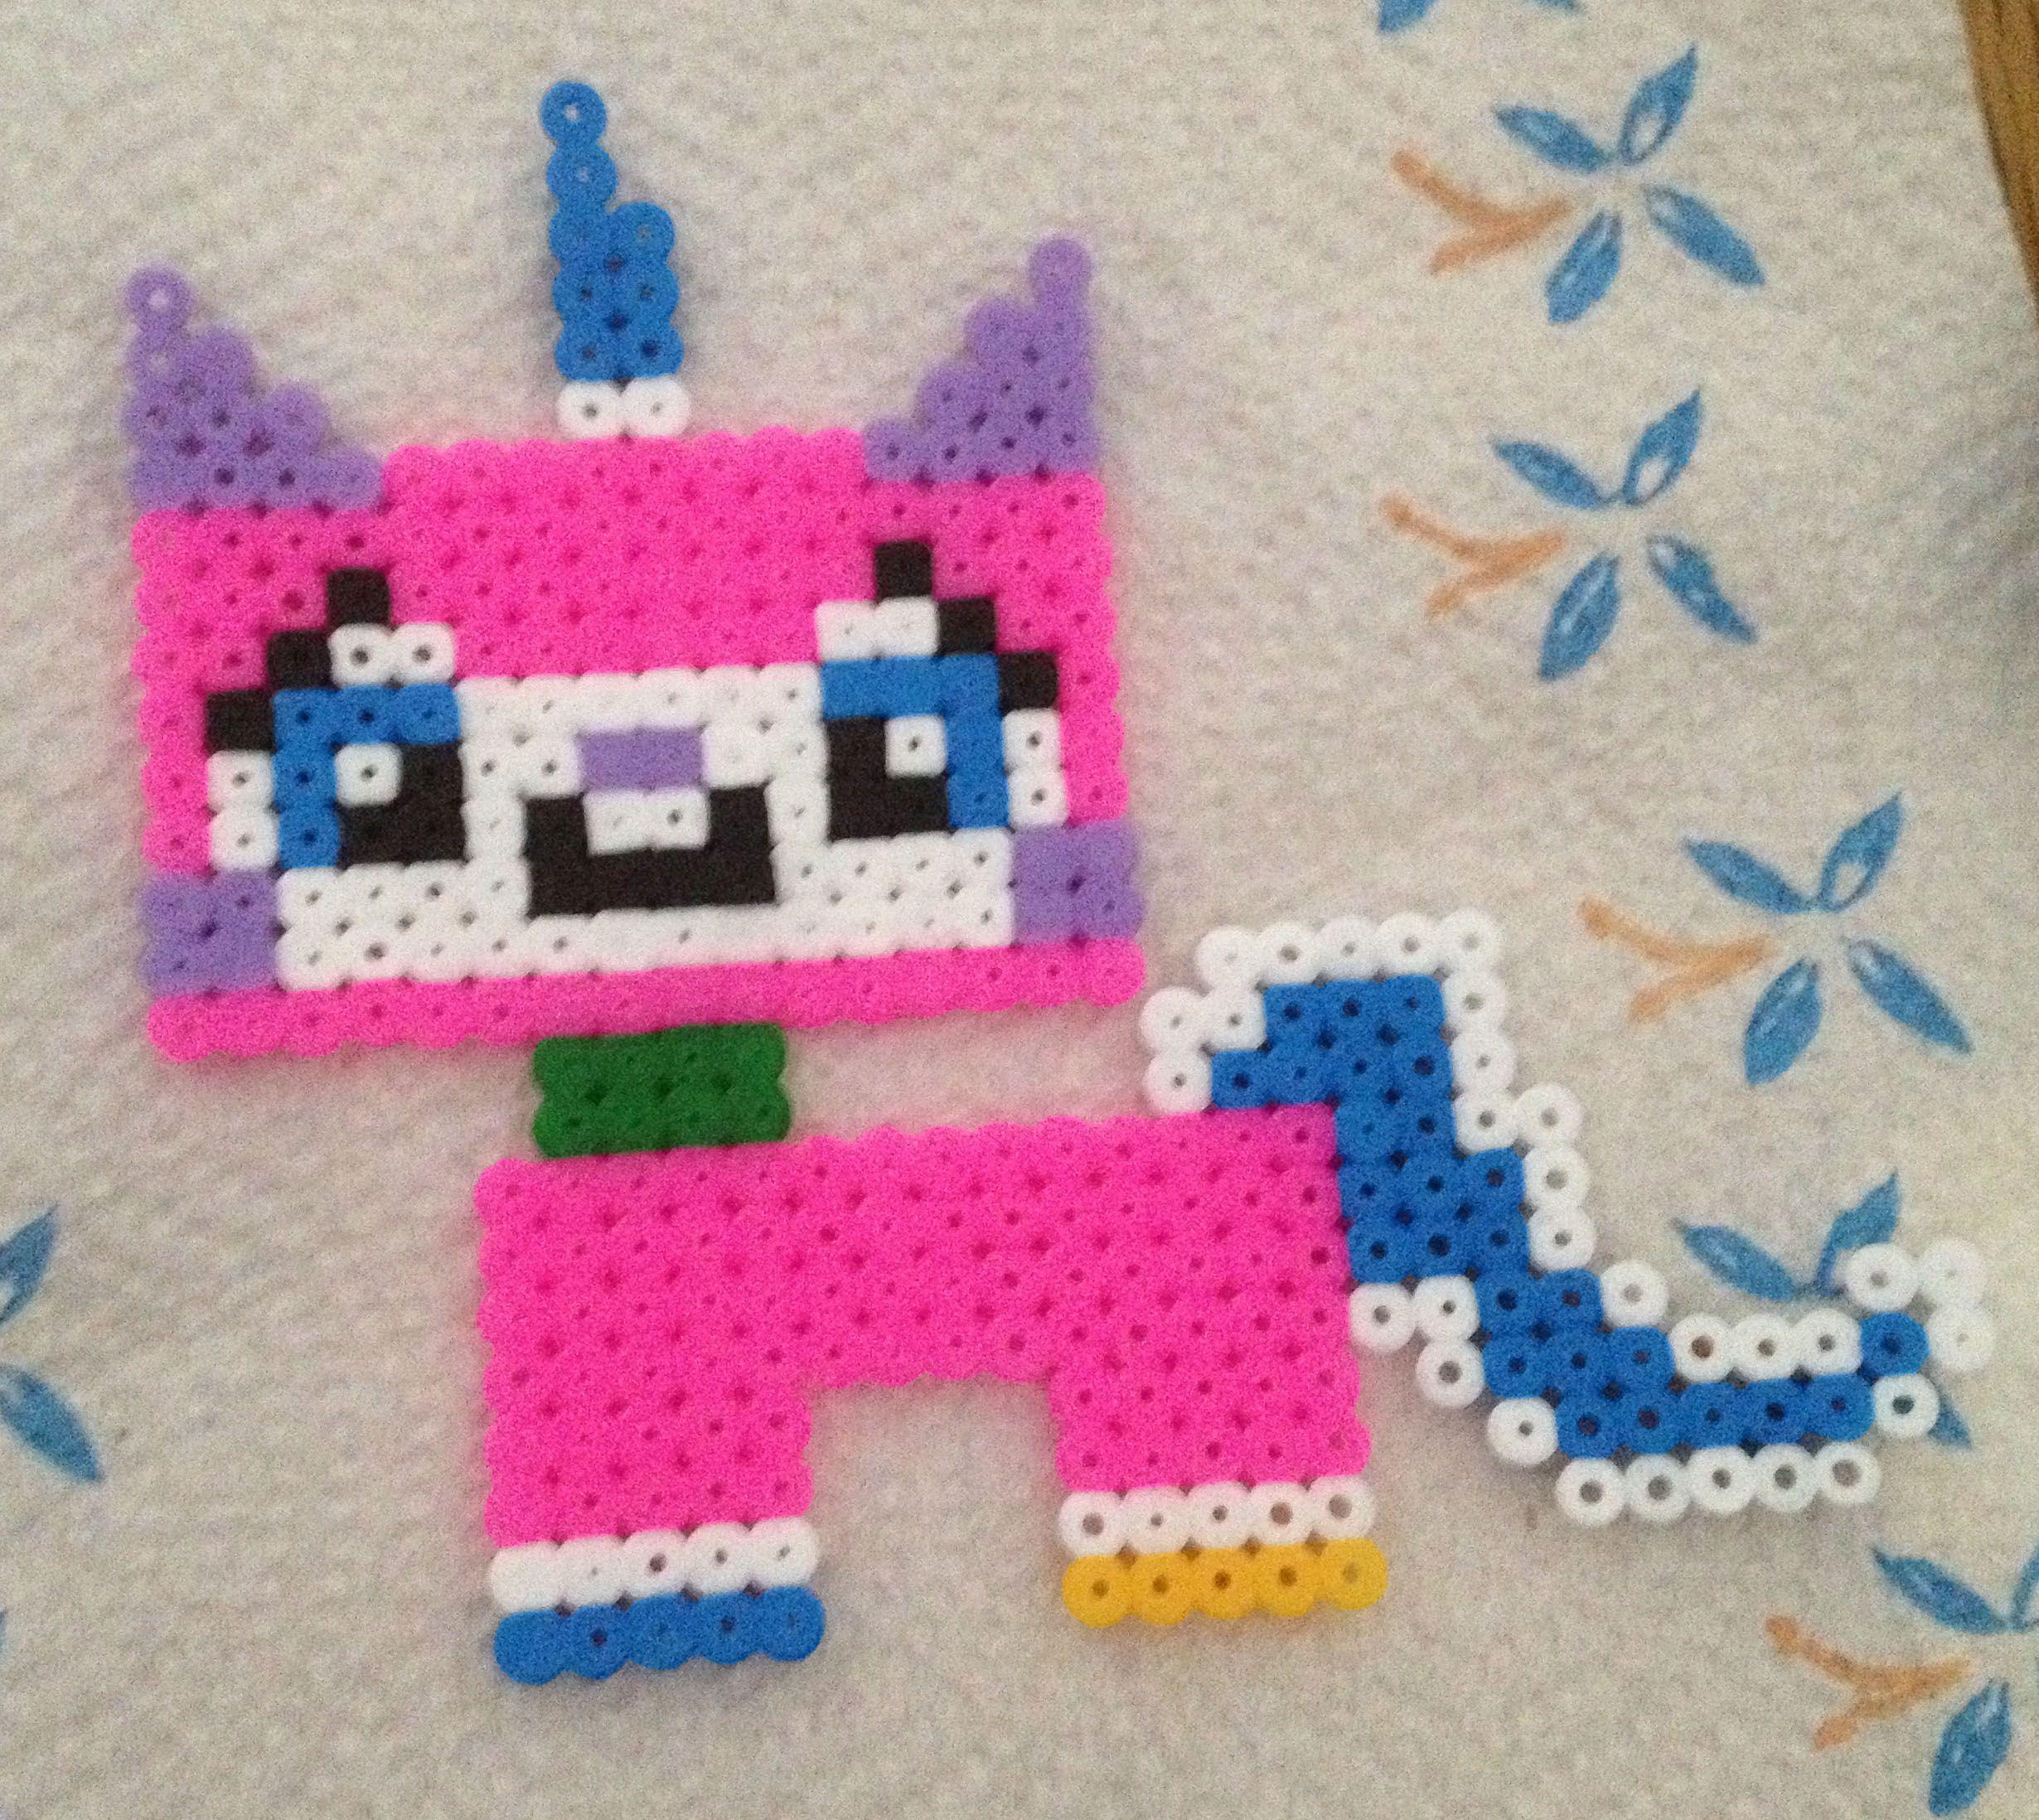 Unikitty from The Lego Movie hama perler beads by Nicky Pybus